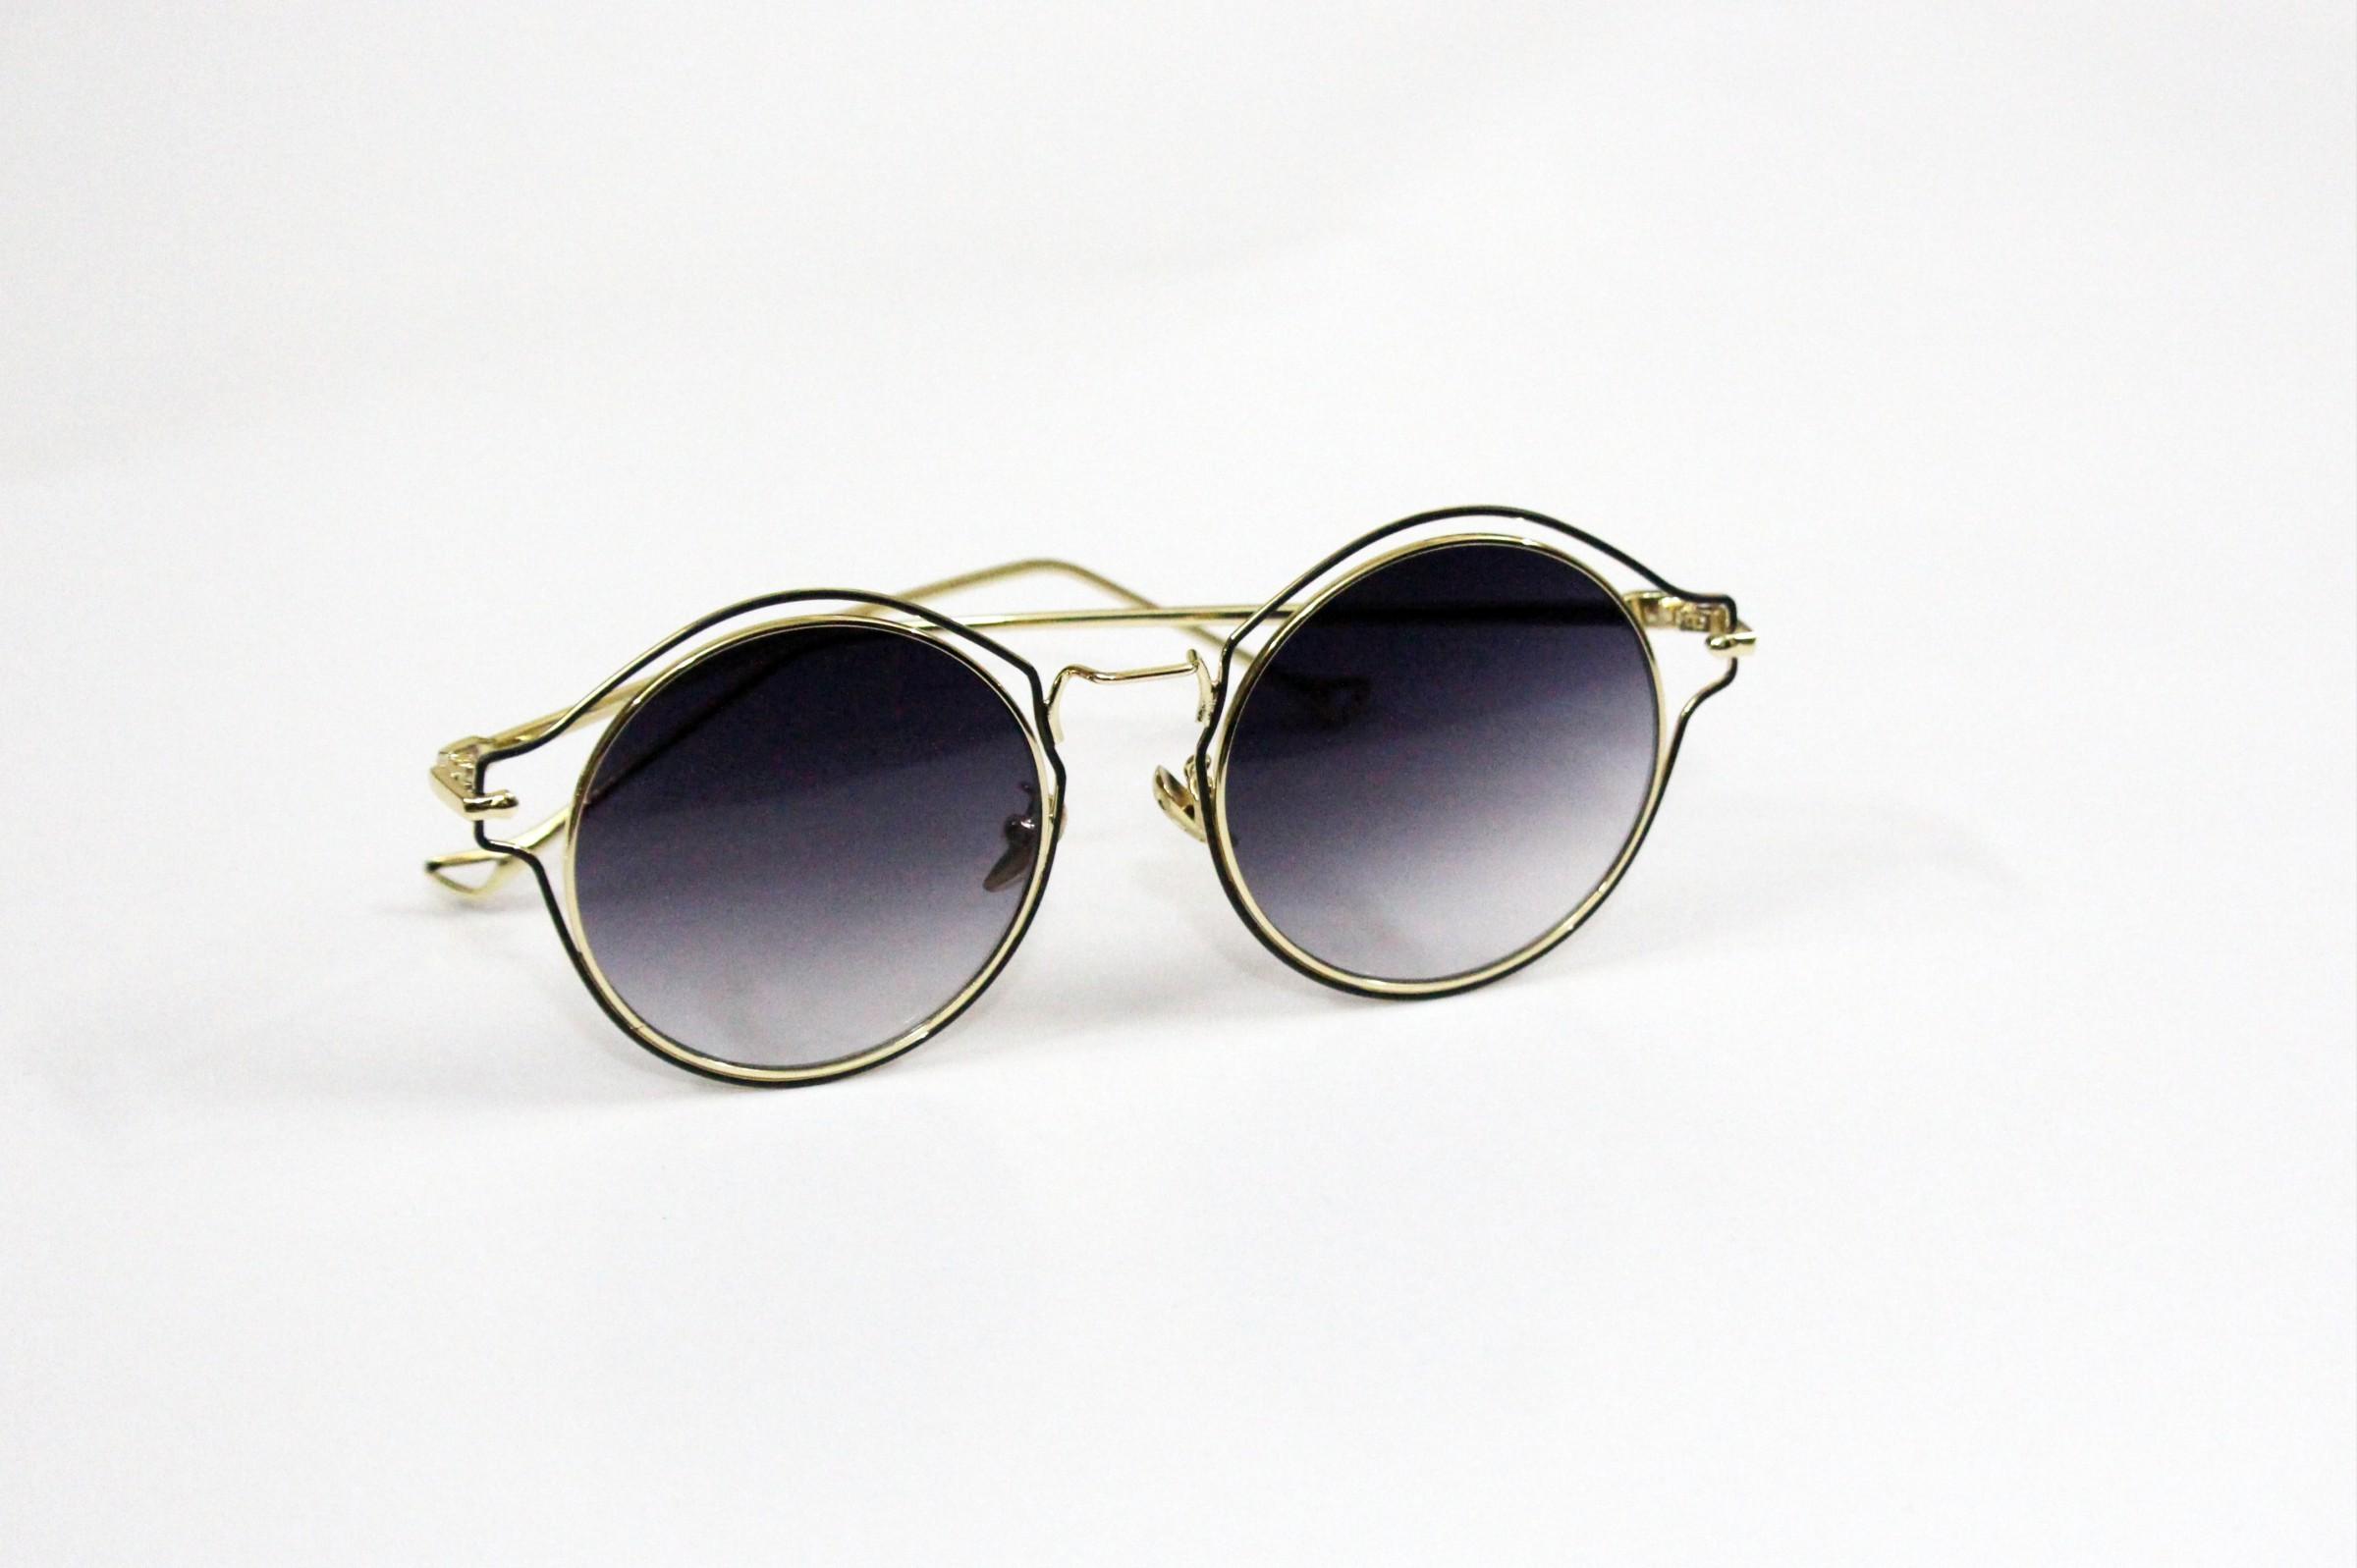 c0ada74fc5 Black Chain Cover Golden Frame Metal Lense Blue Markar Standard Size China  UV Round Unisex Sunglass ...